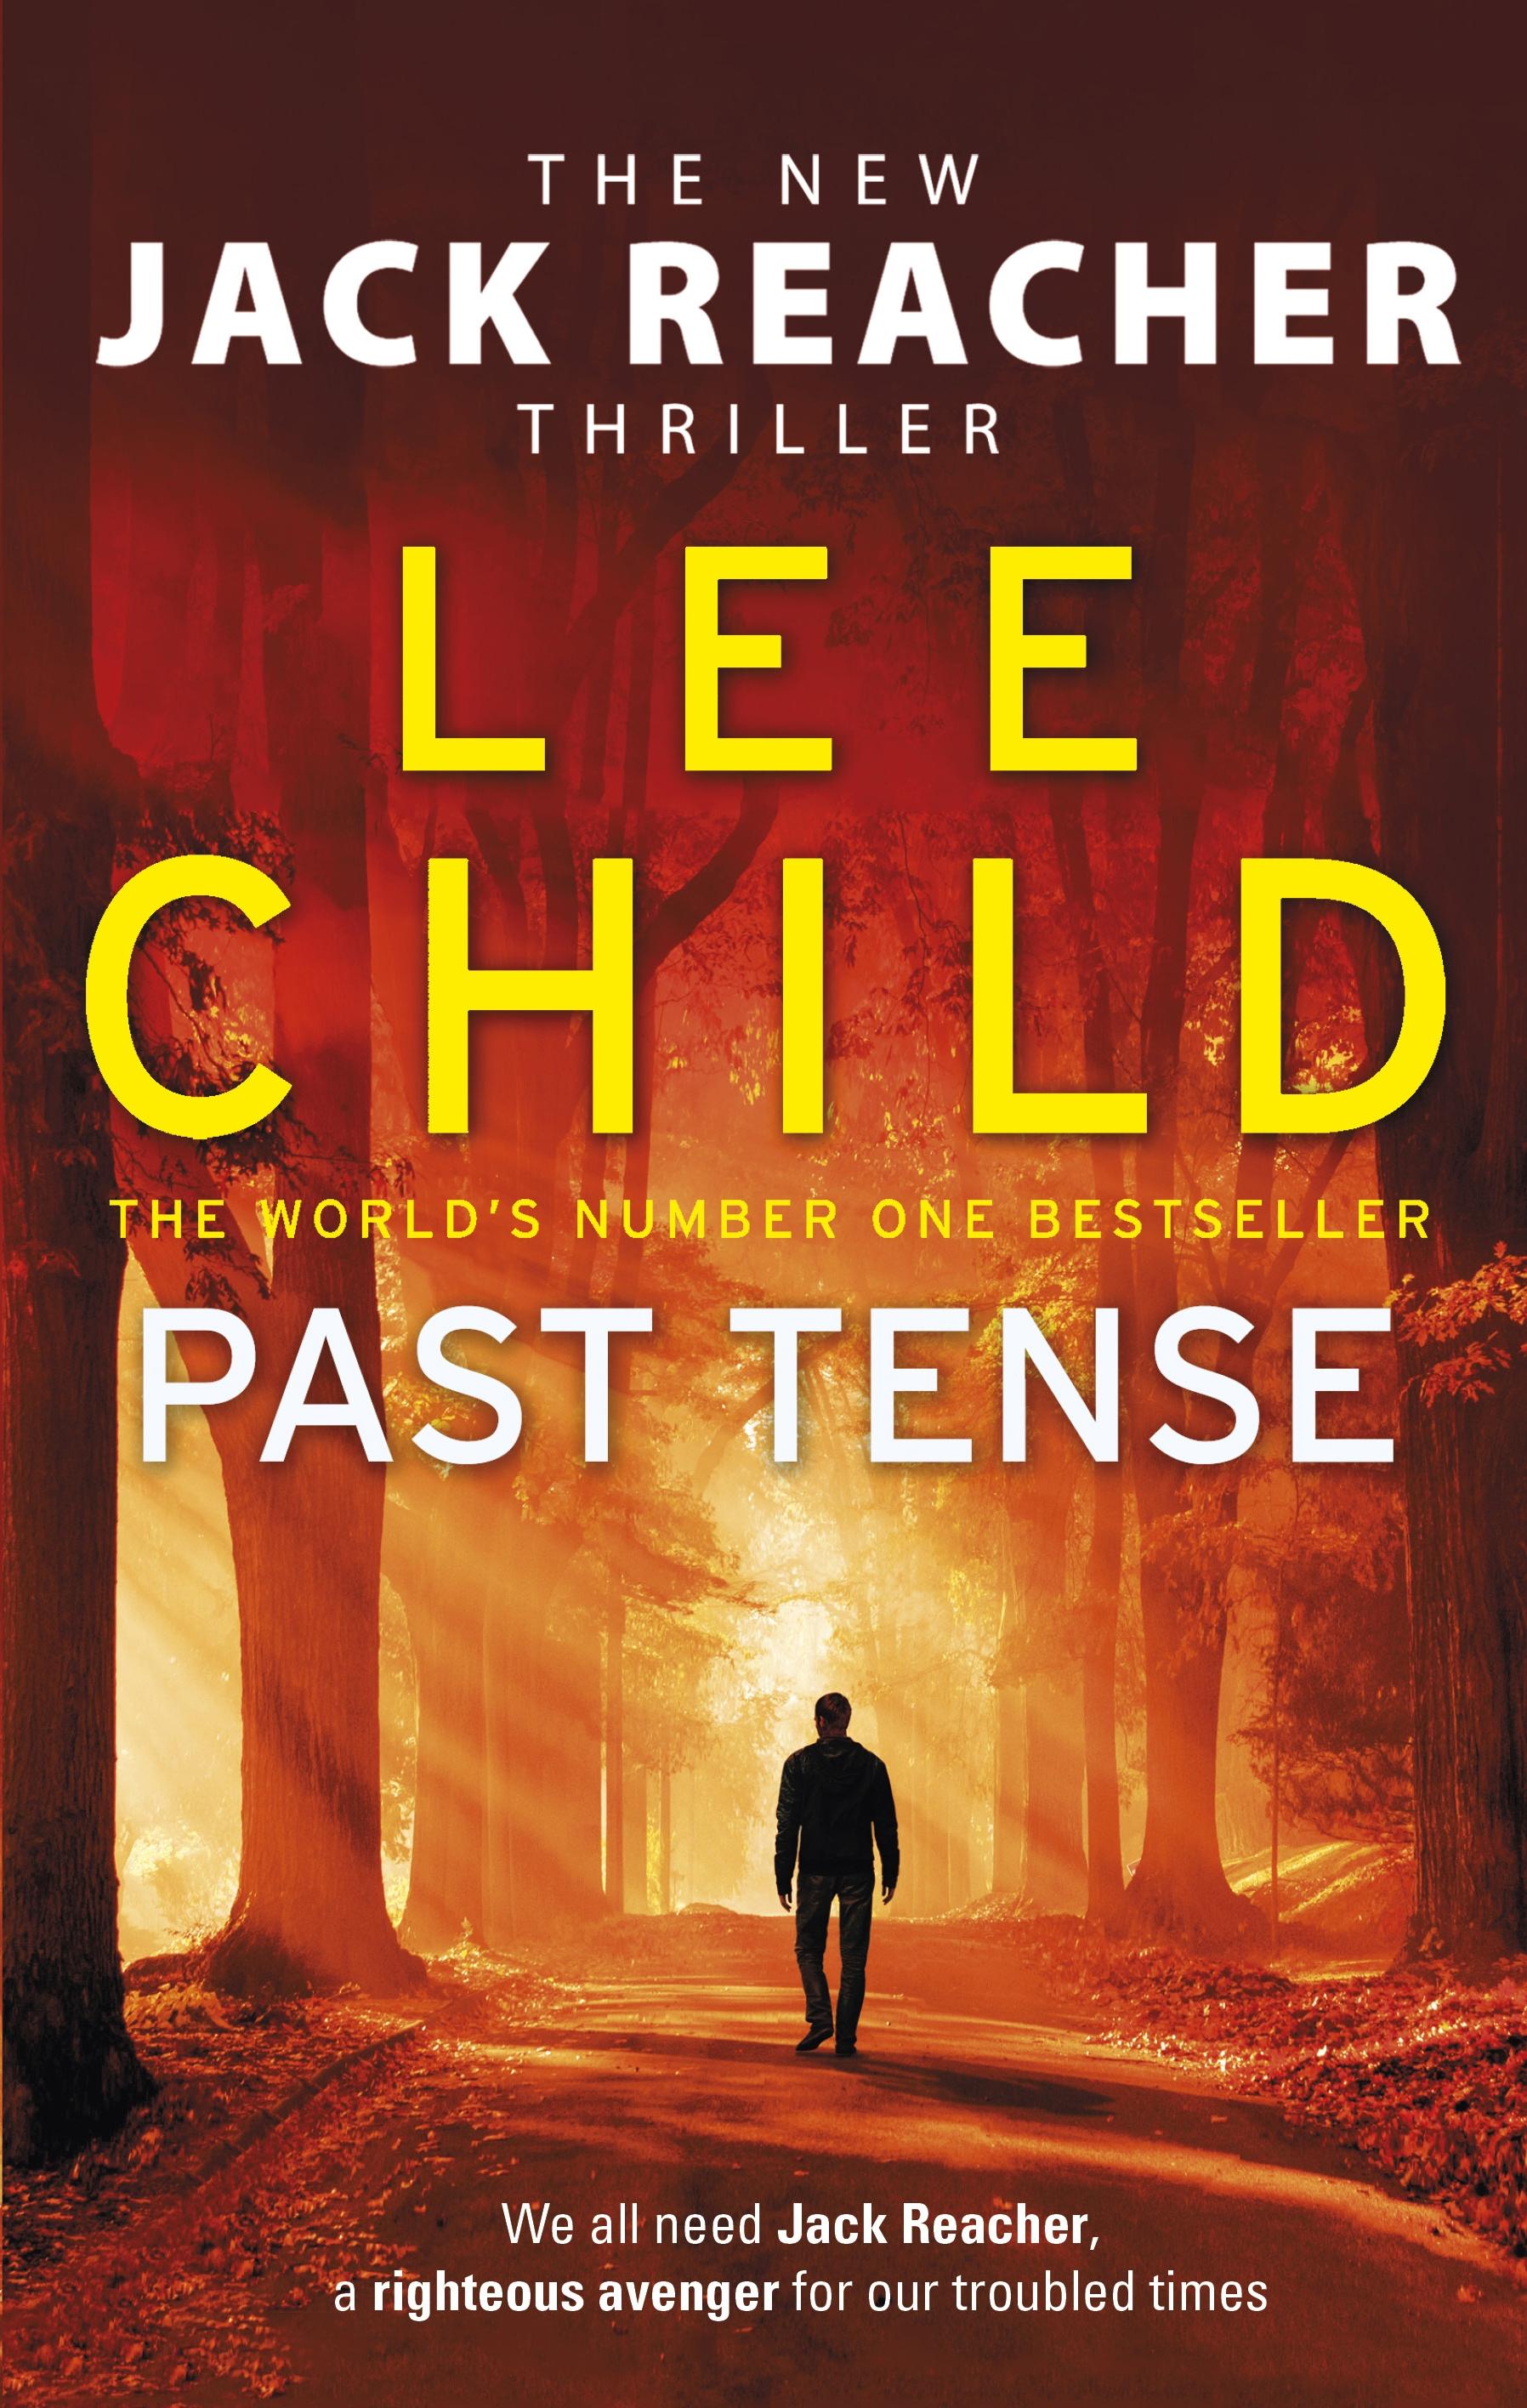 Lee Child's Past Tense.